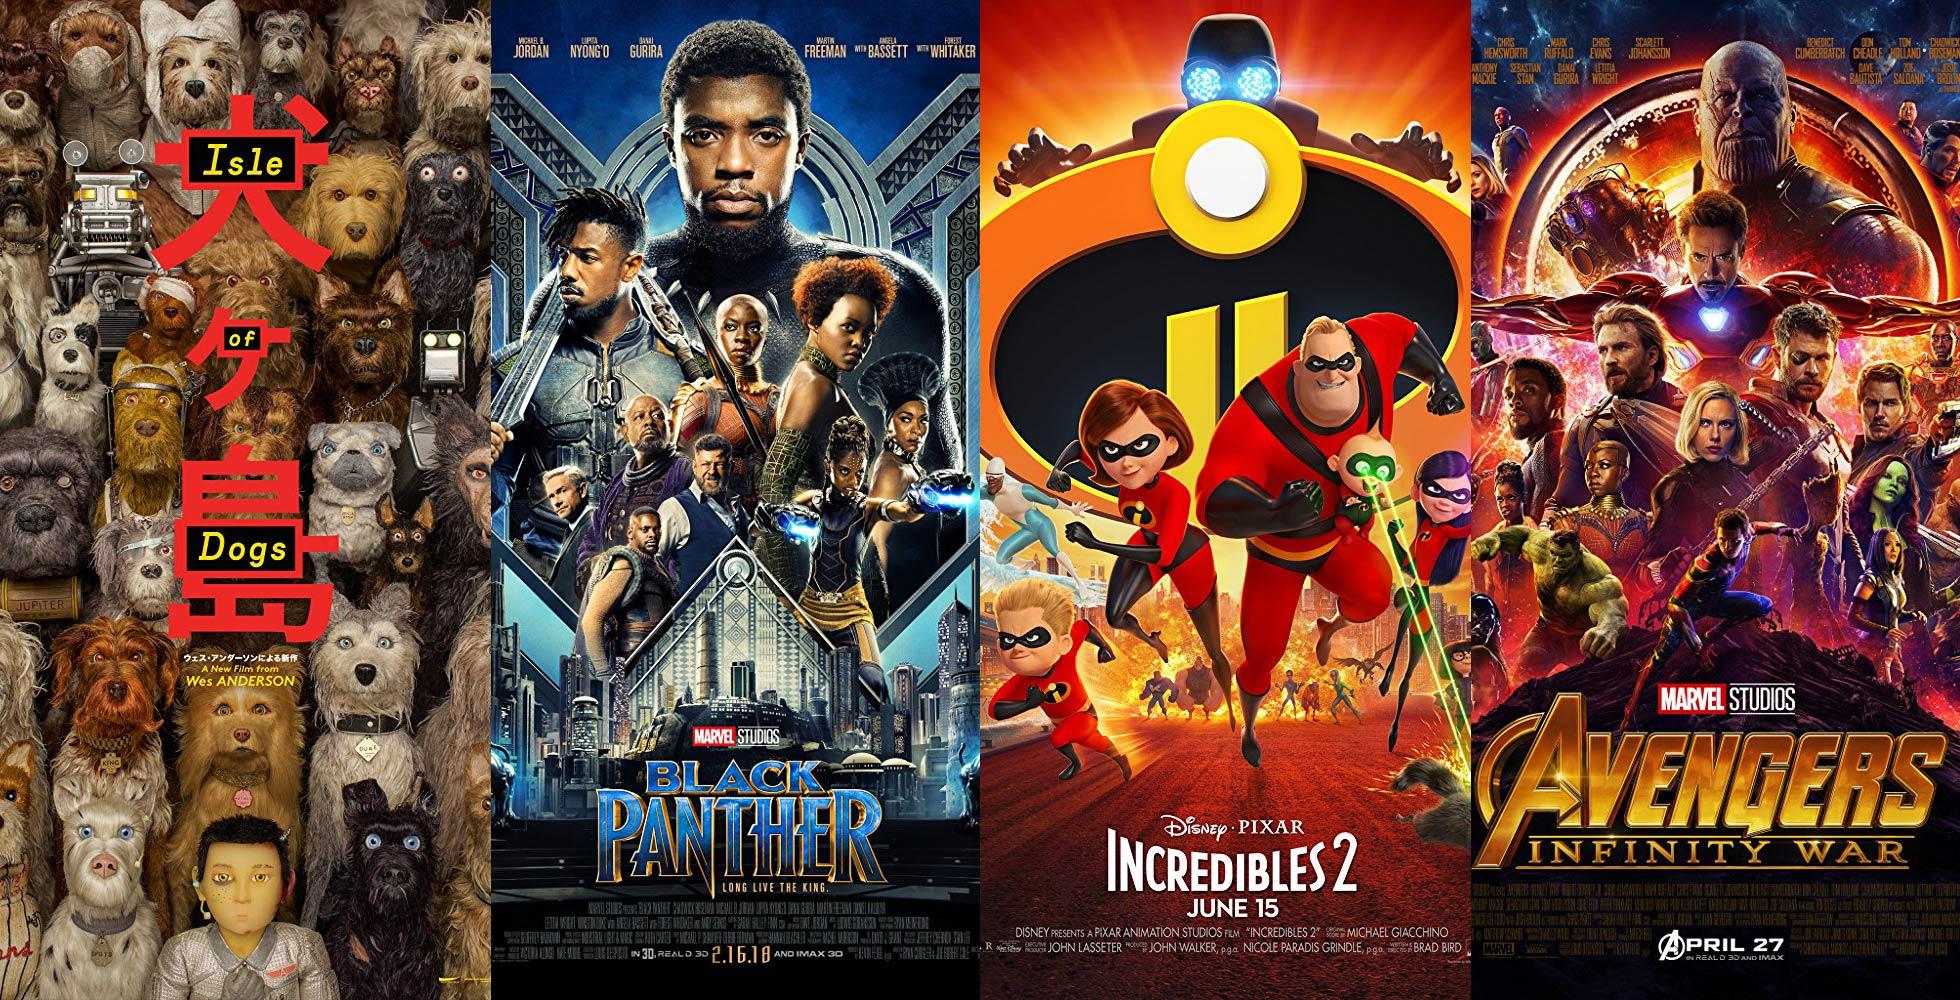 <em>Oscar nominated films: Isle Of Dogs, Black Panther, Incredibles 2, Avengers: Infinity War</em>